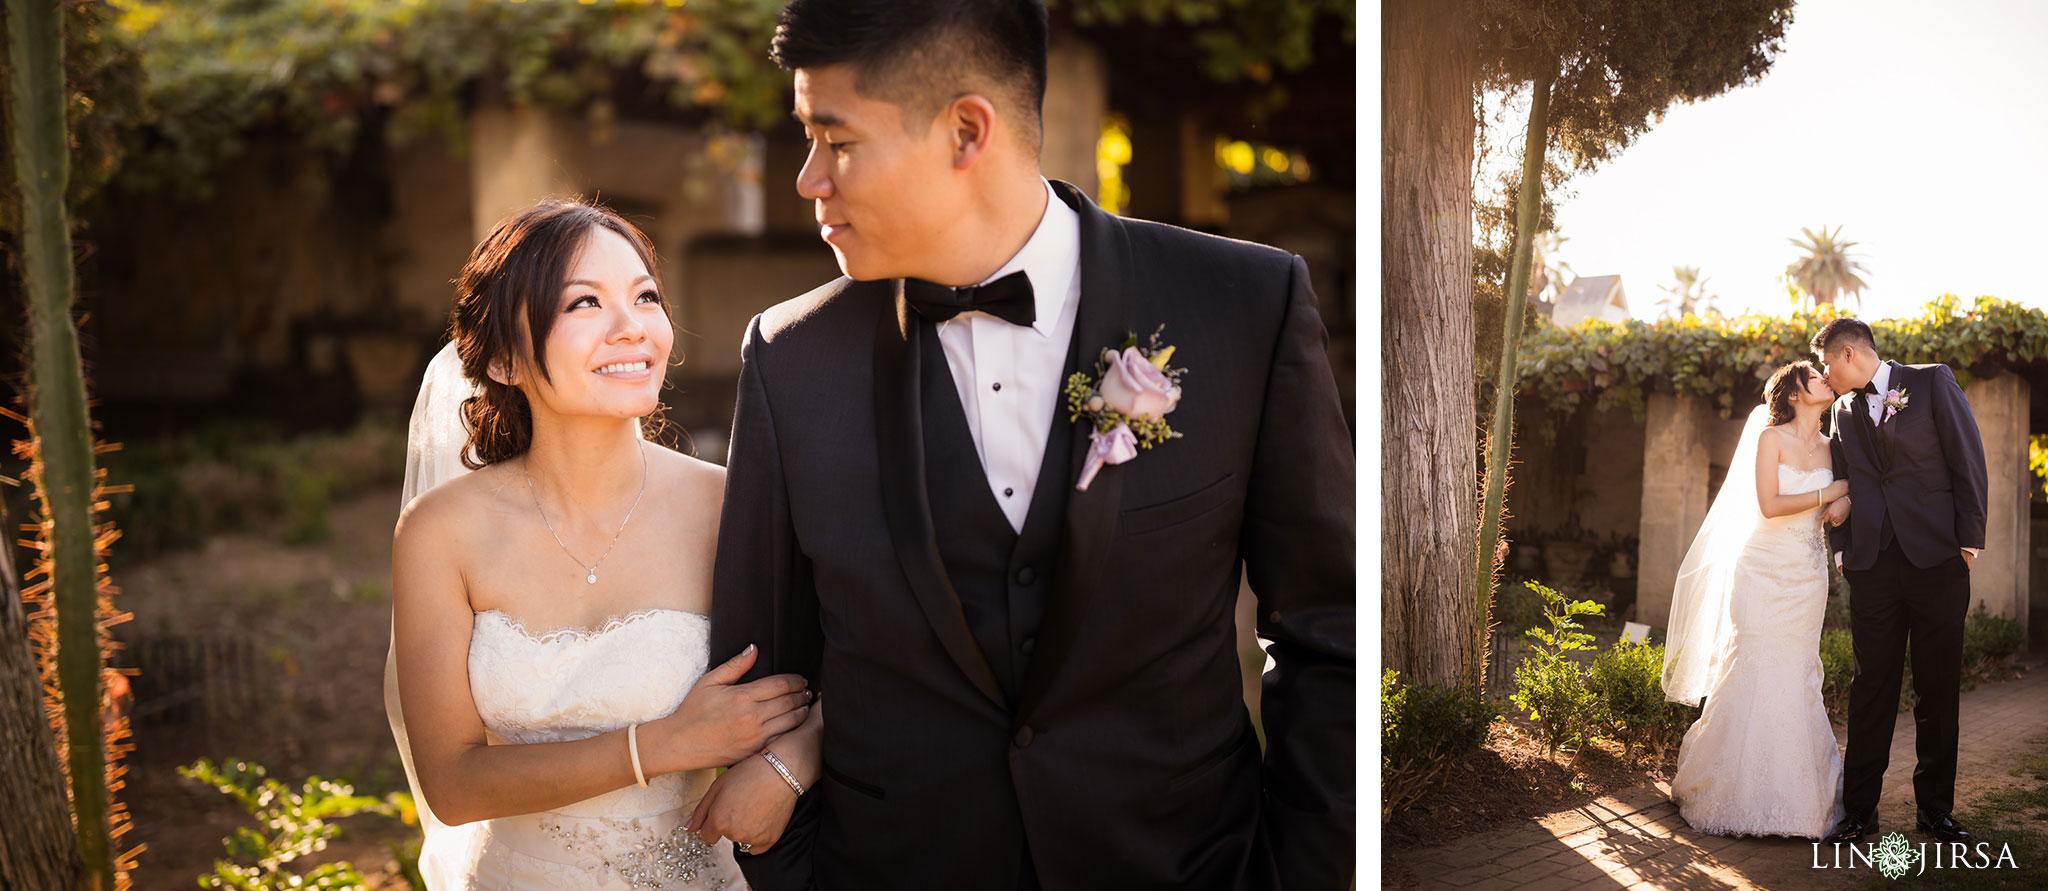 15 orange county wedding photography